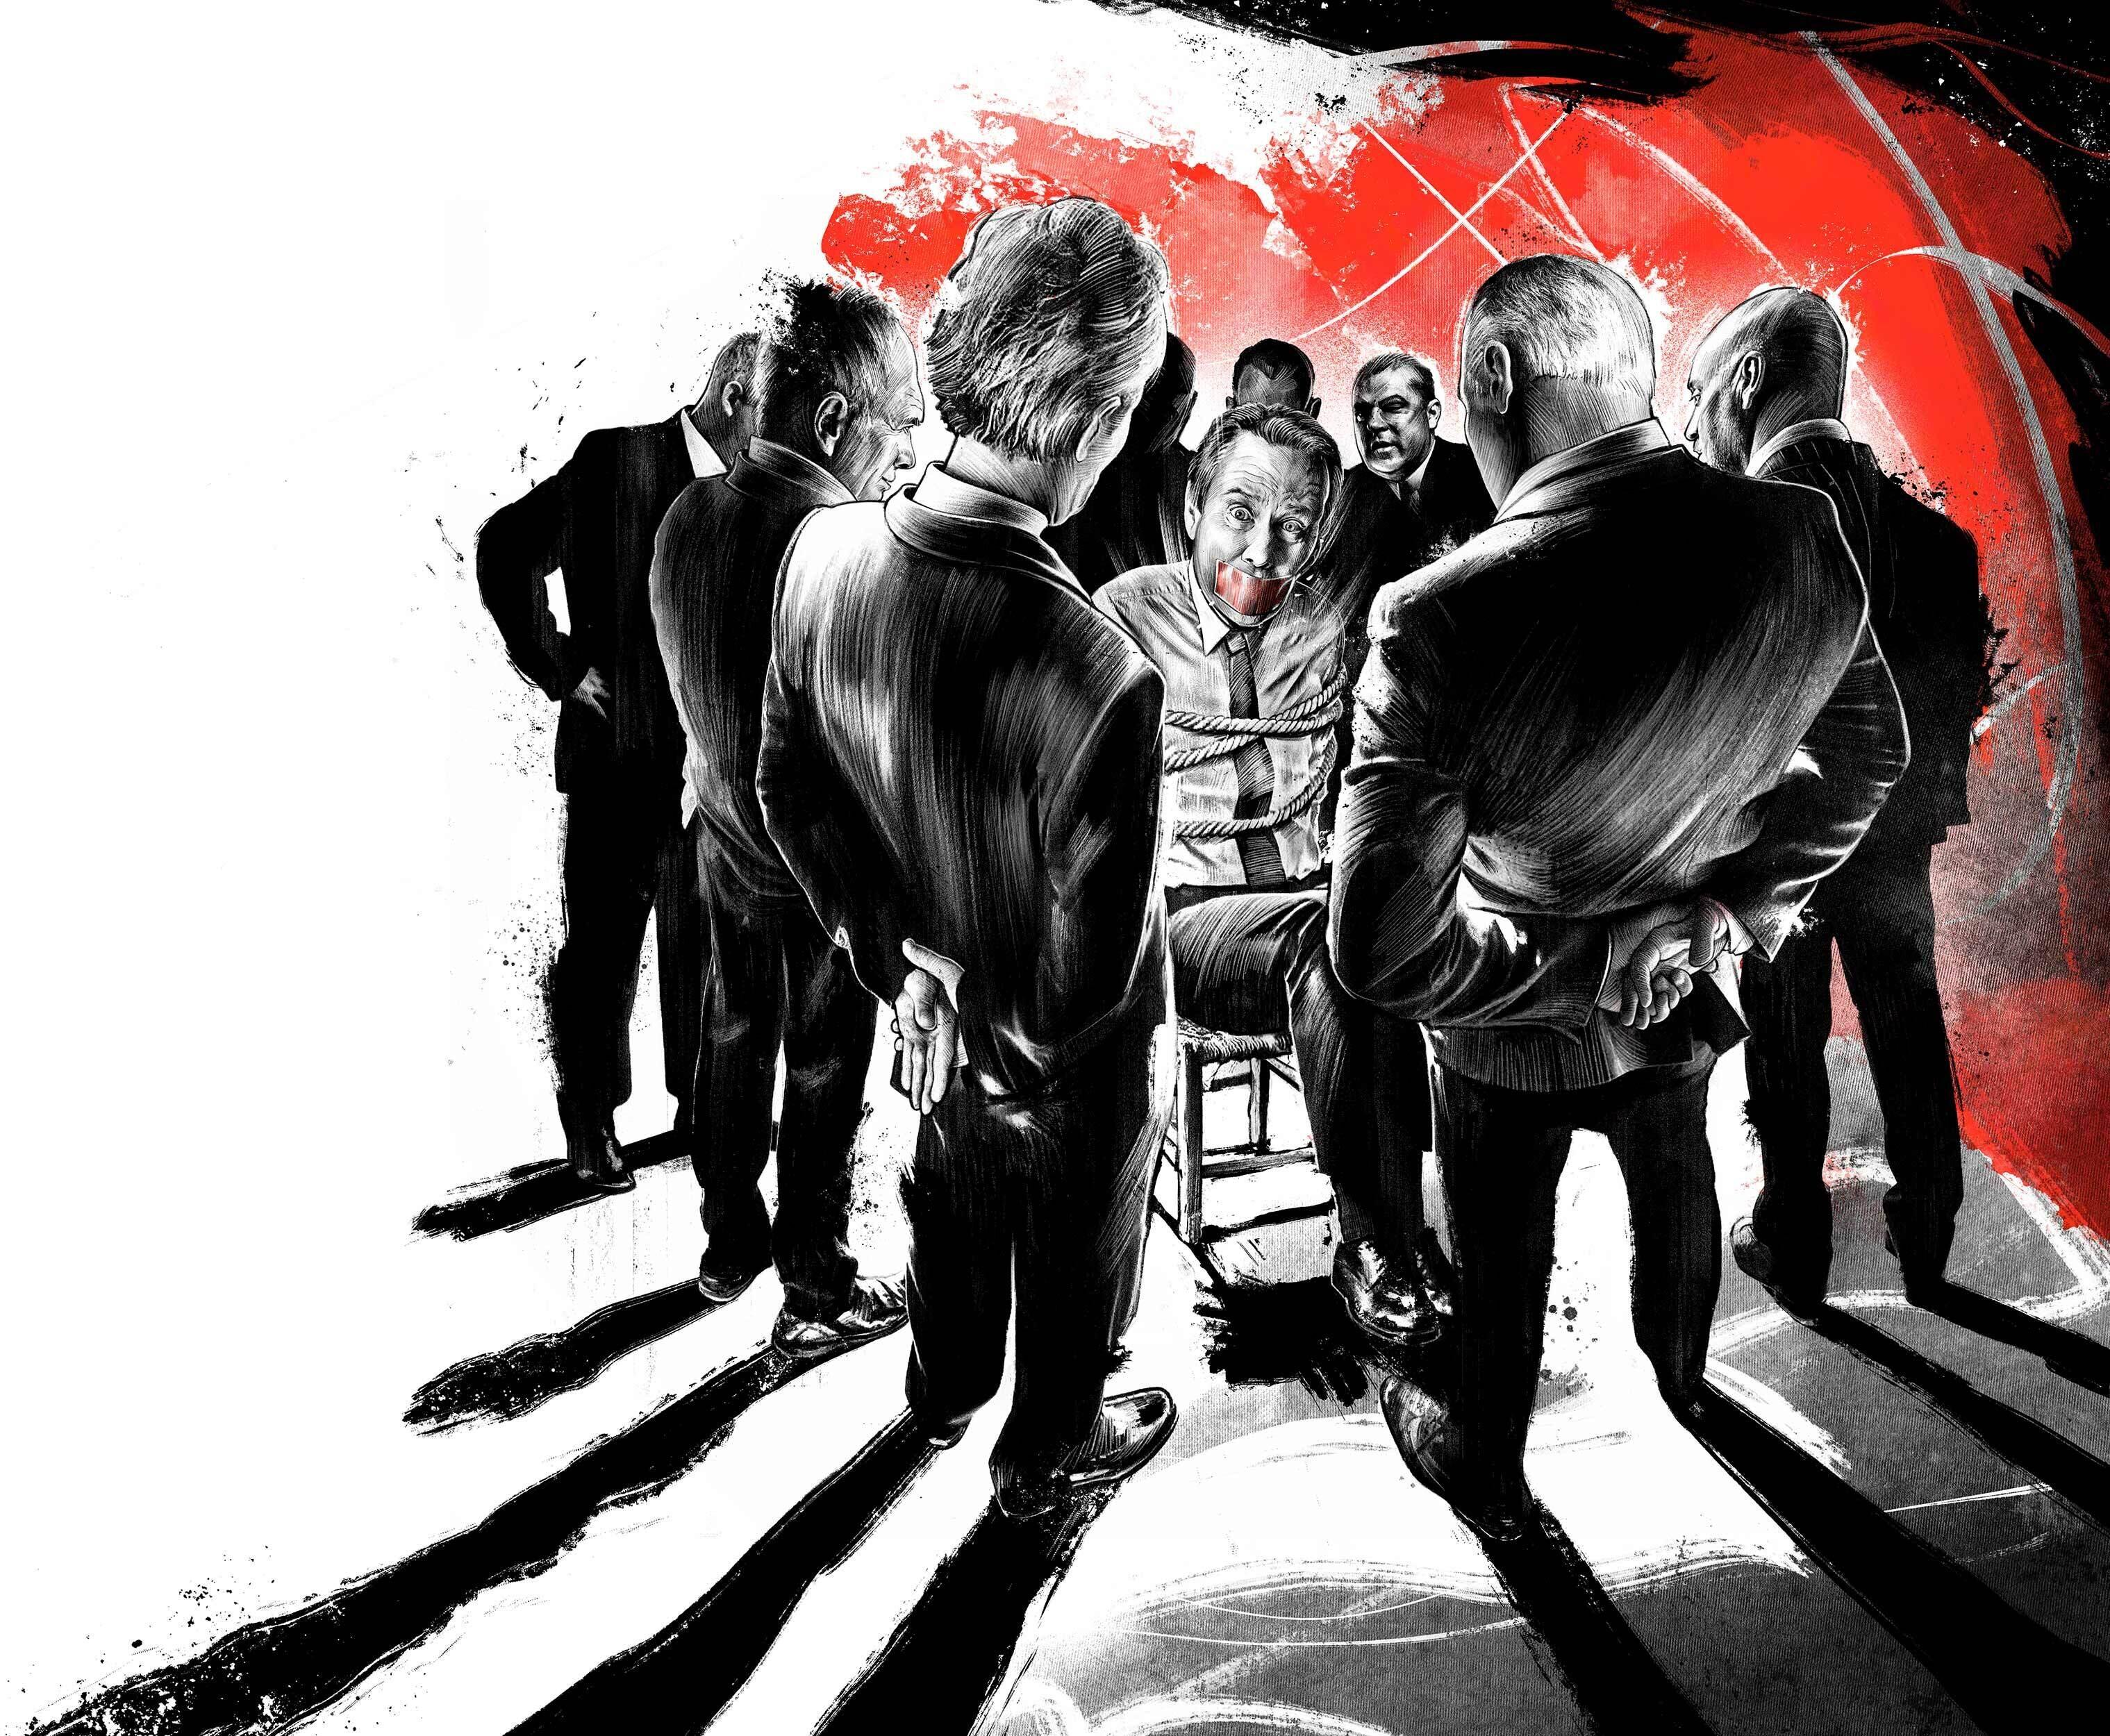 Editorial illustration magazine board members aktionaere ink drawing crime scene kidnapped geknebelt - Kornel Illustration | Kornel Stadler portfolio